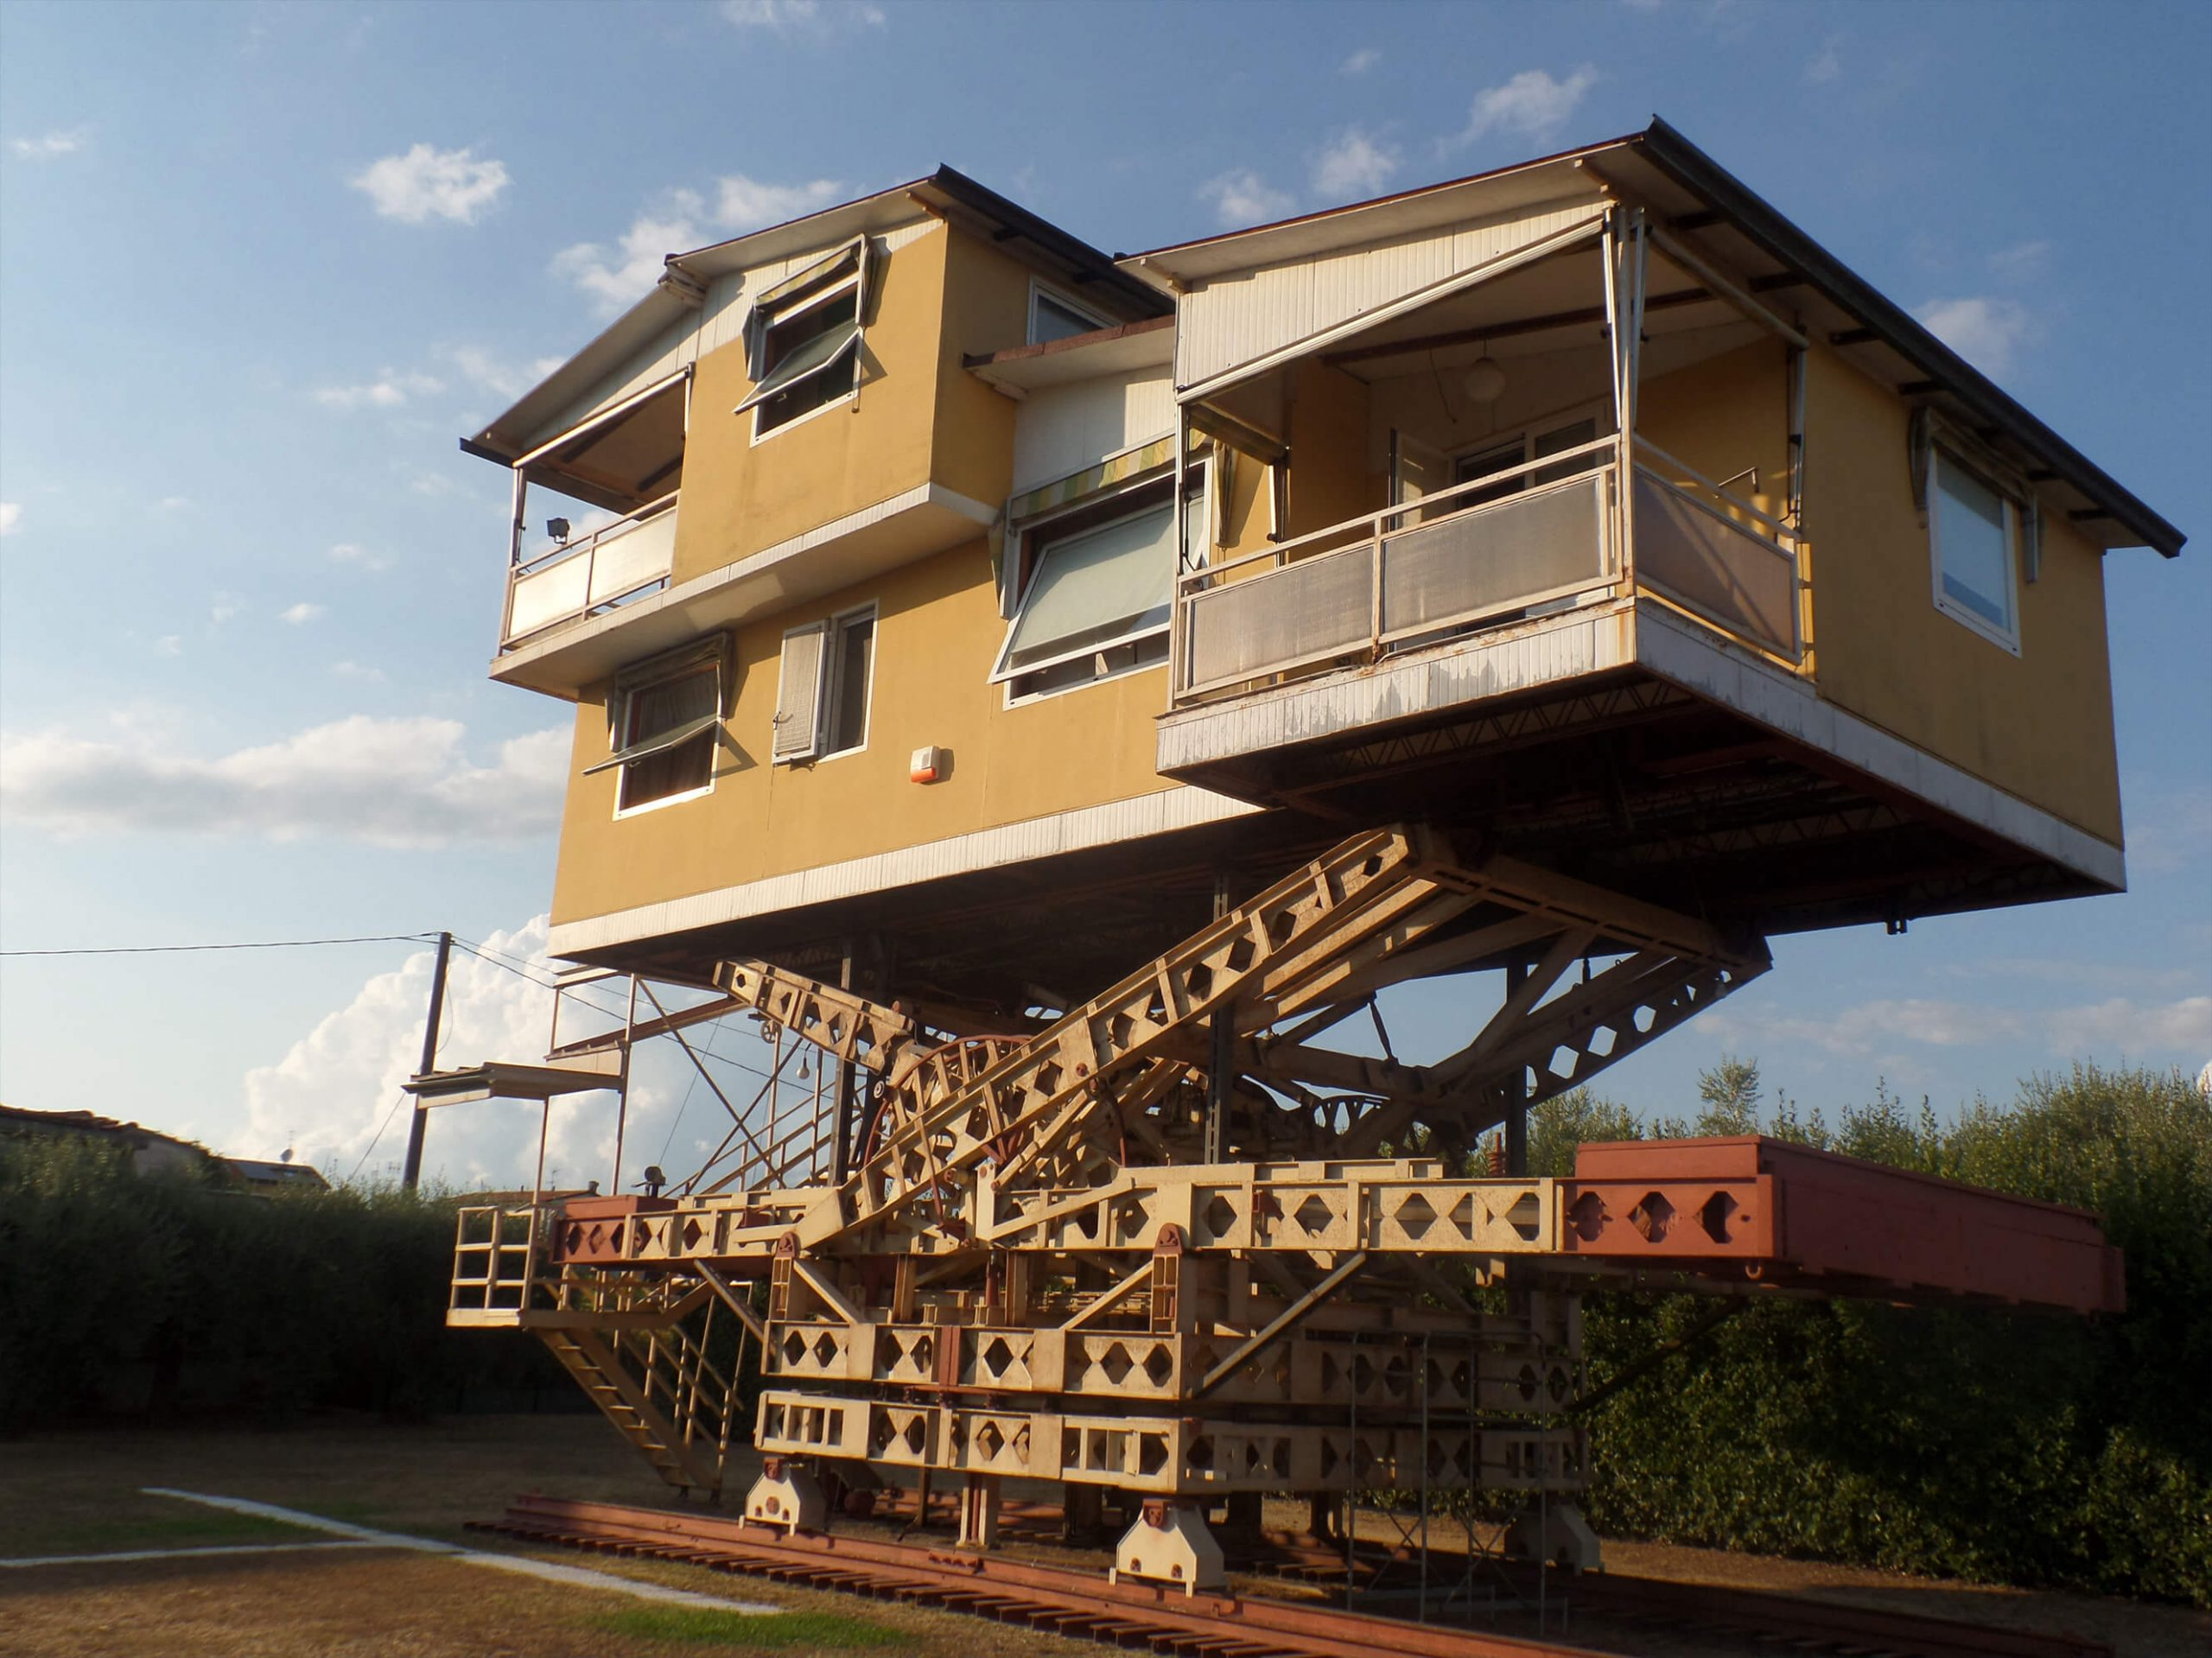 casa sobre estructura levitante